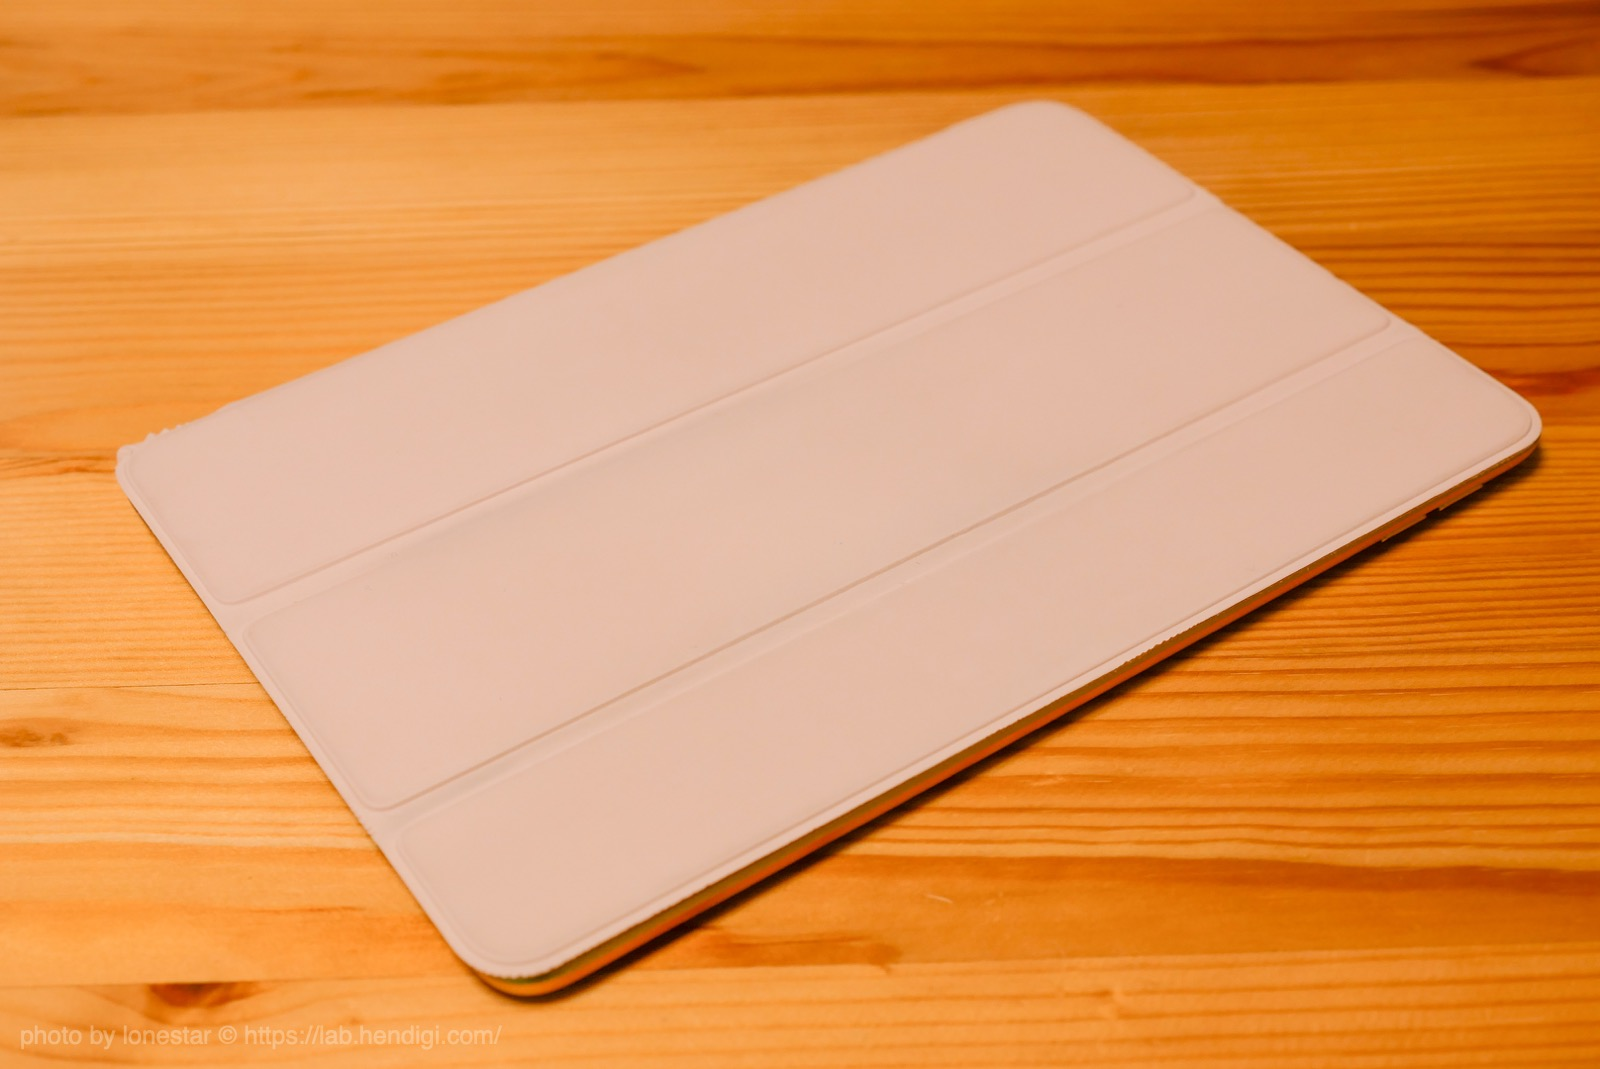 iPad mini スマートカバー 劣化